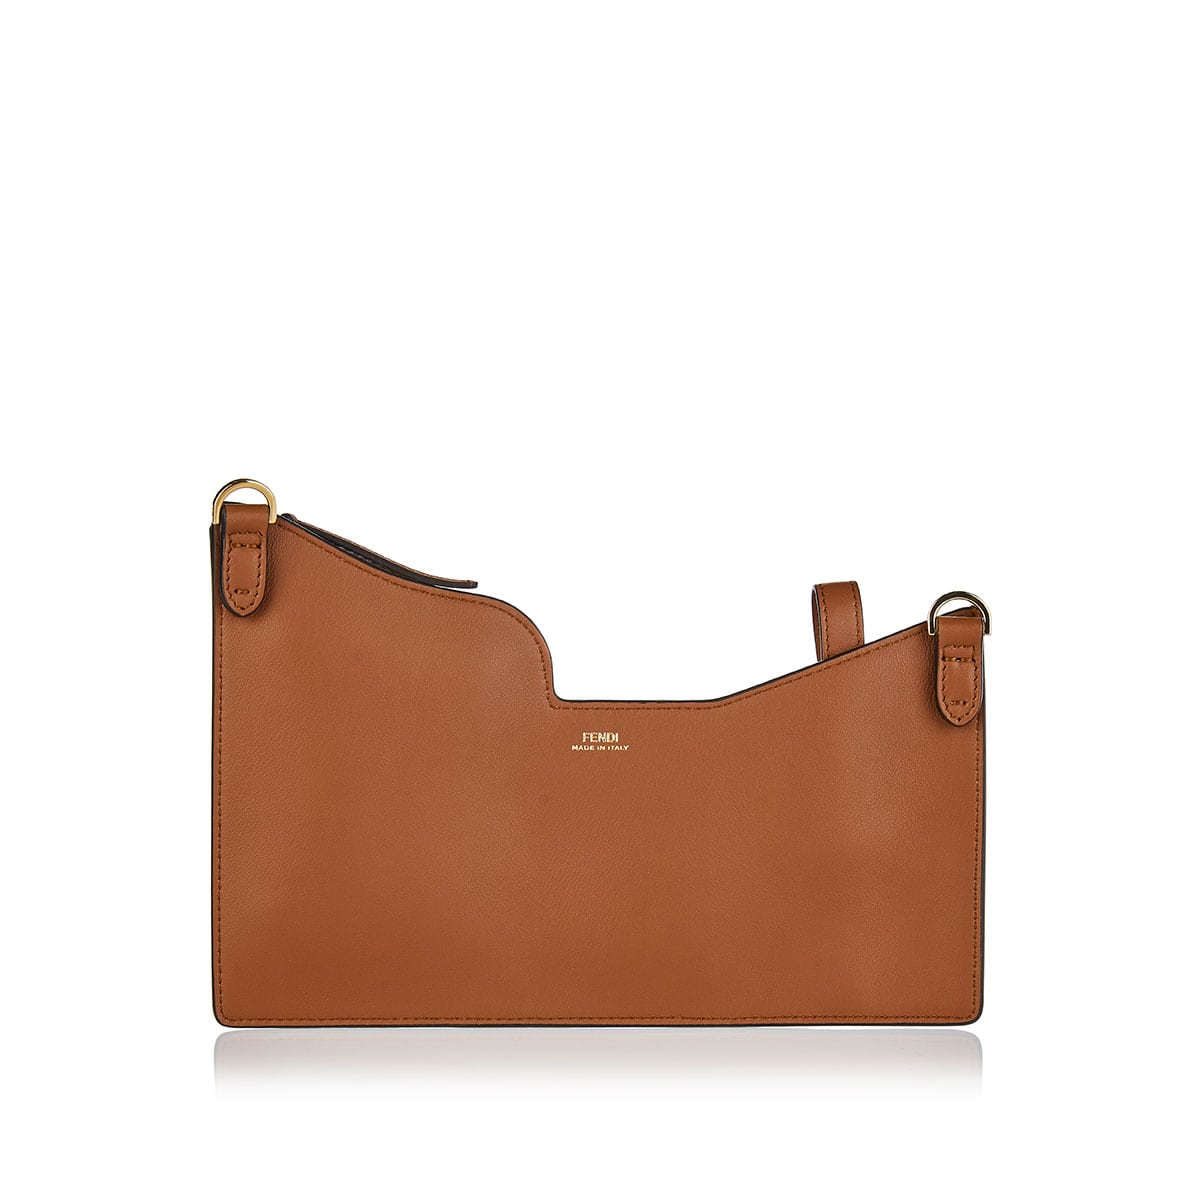 Utility-style leather crossbody bag